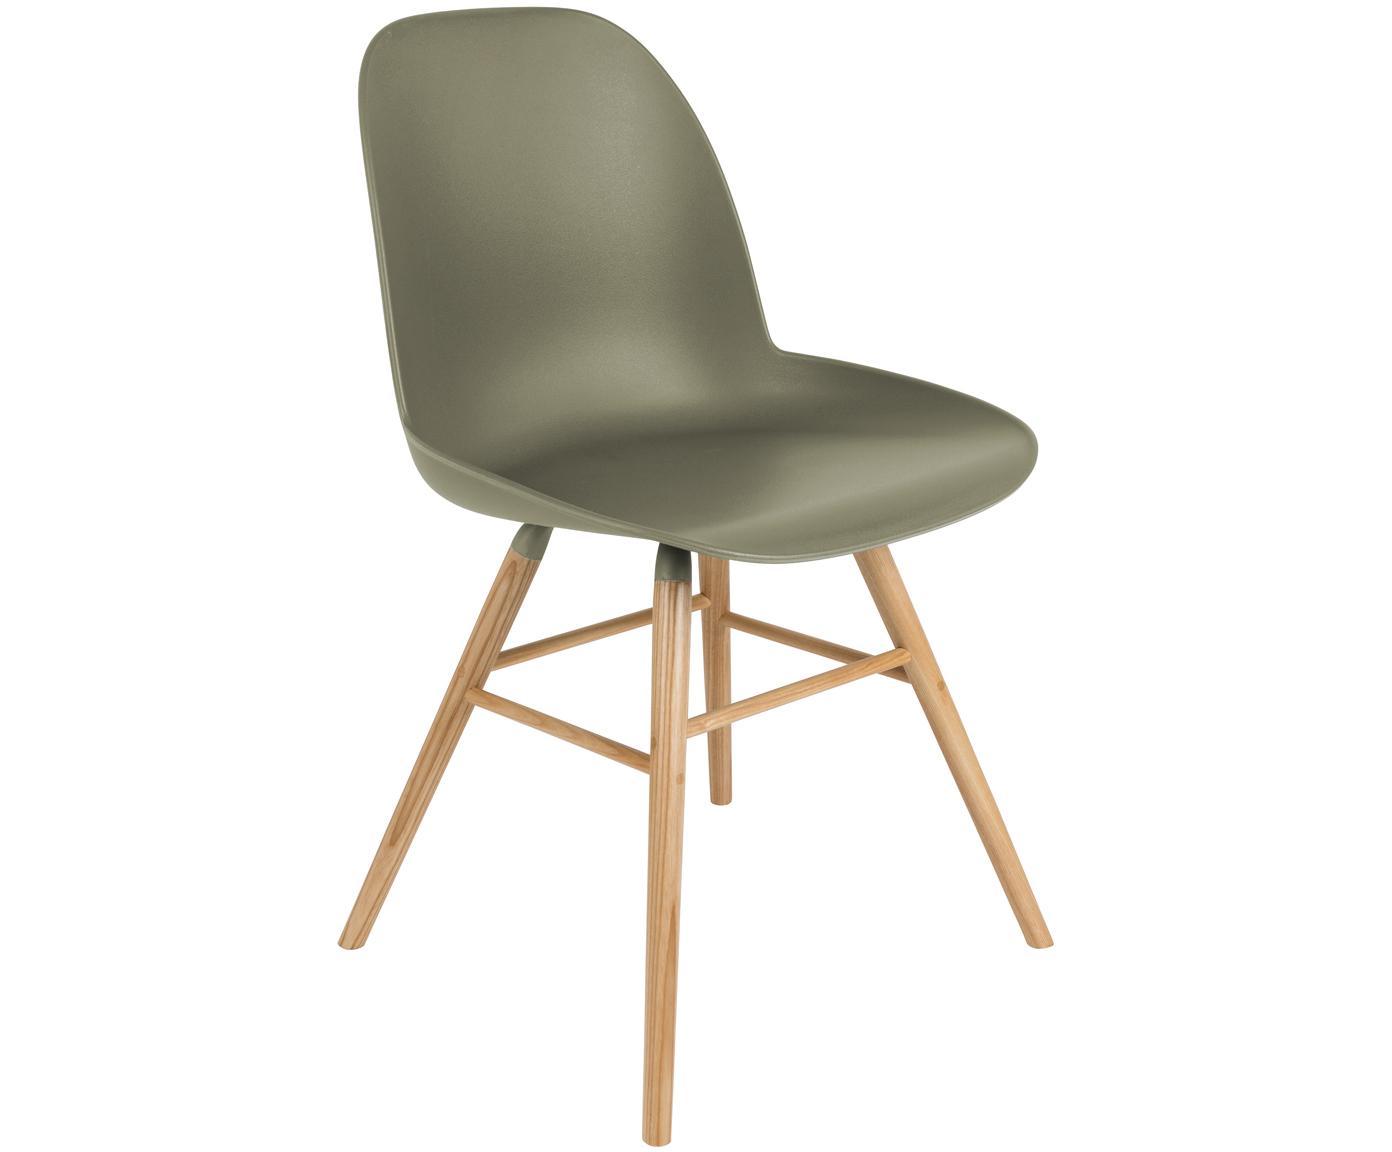 Kunststoffstuhl Albert Kuip mit Holzbeinen, Sitzschale: Polypropylen, Beine: Eschenholz, Grün, B 49 x T 55 cm